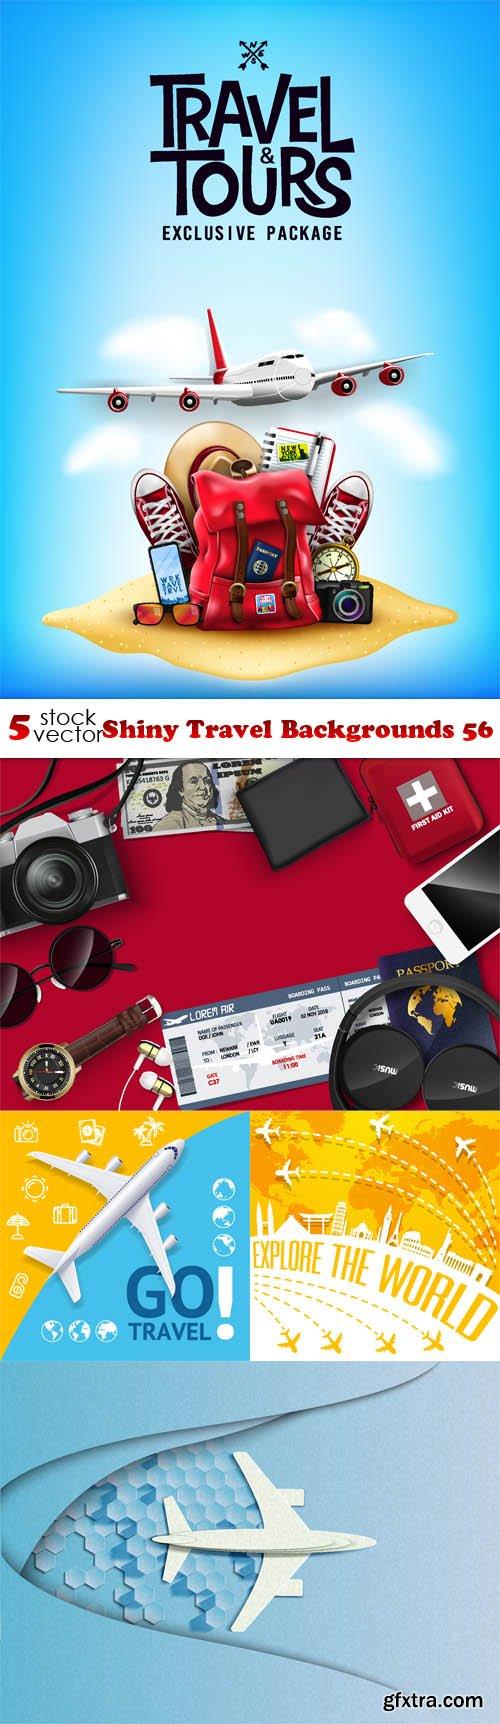 Vectors - Shiny Travel Backgrounds 56